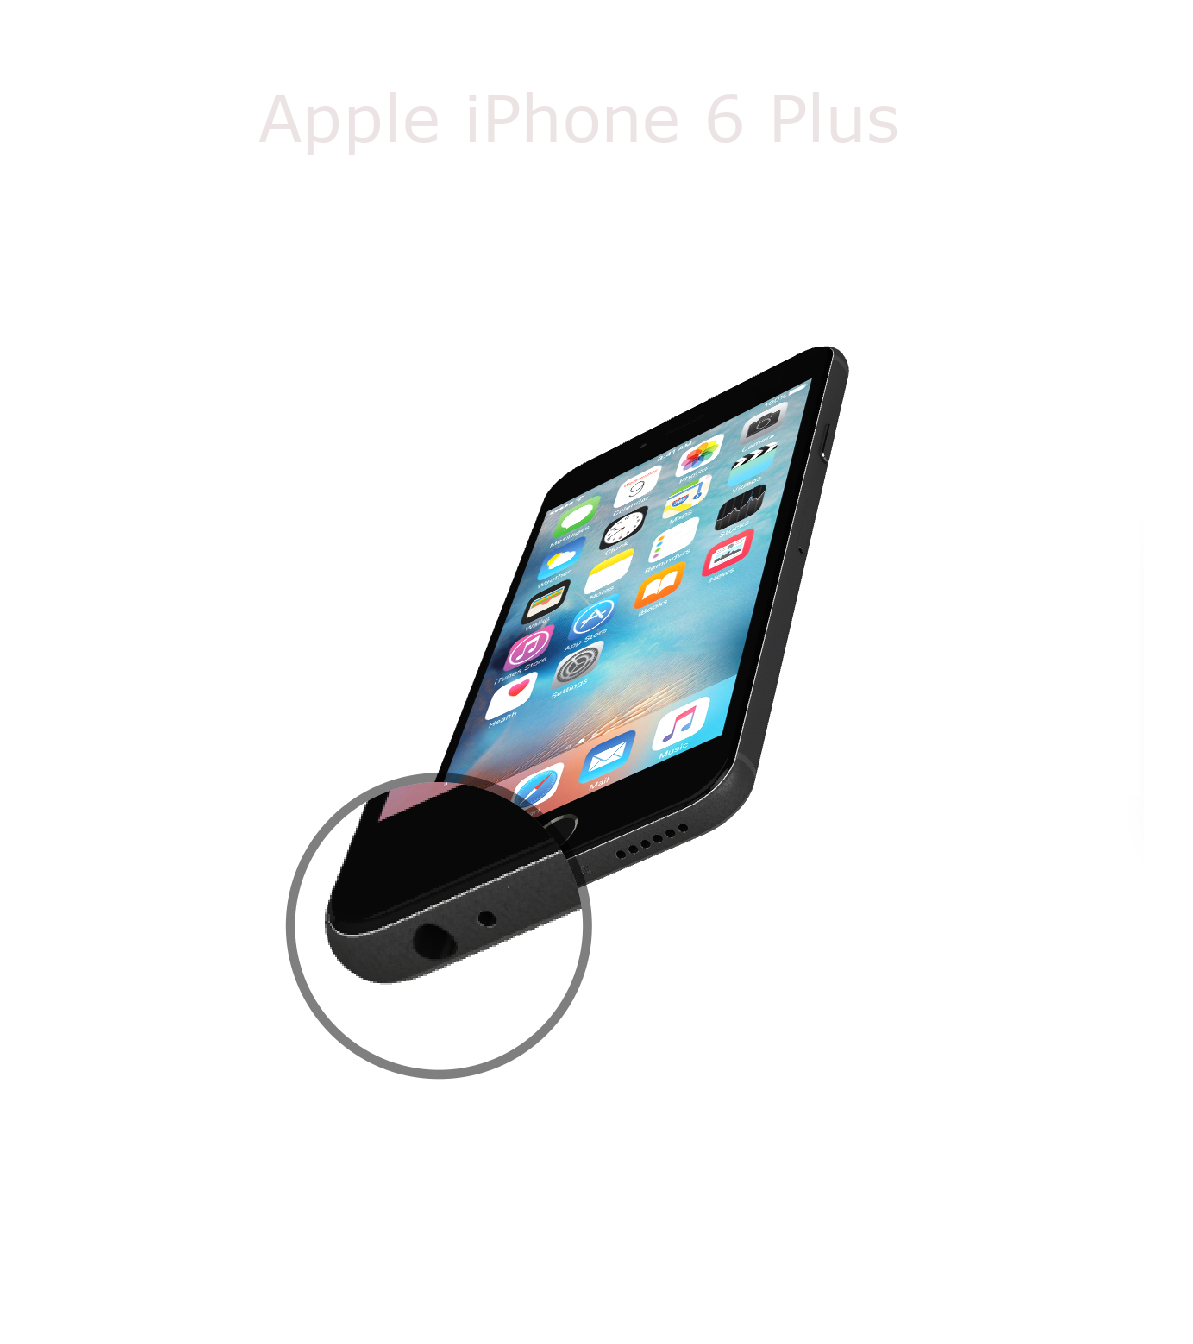 Laga mikrofon iPhone 6 plus